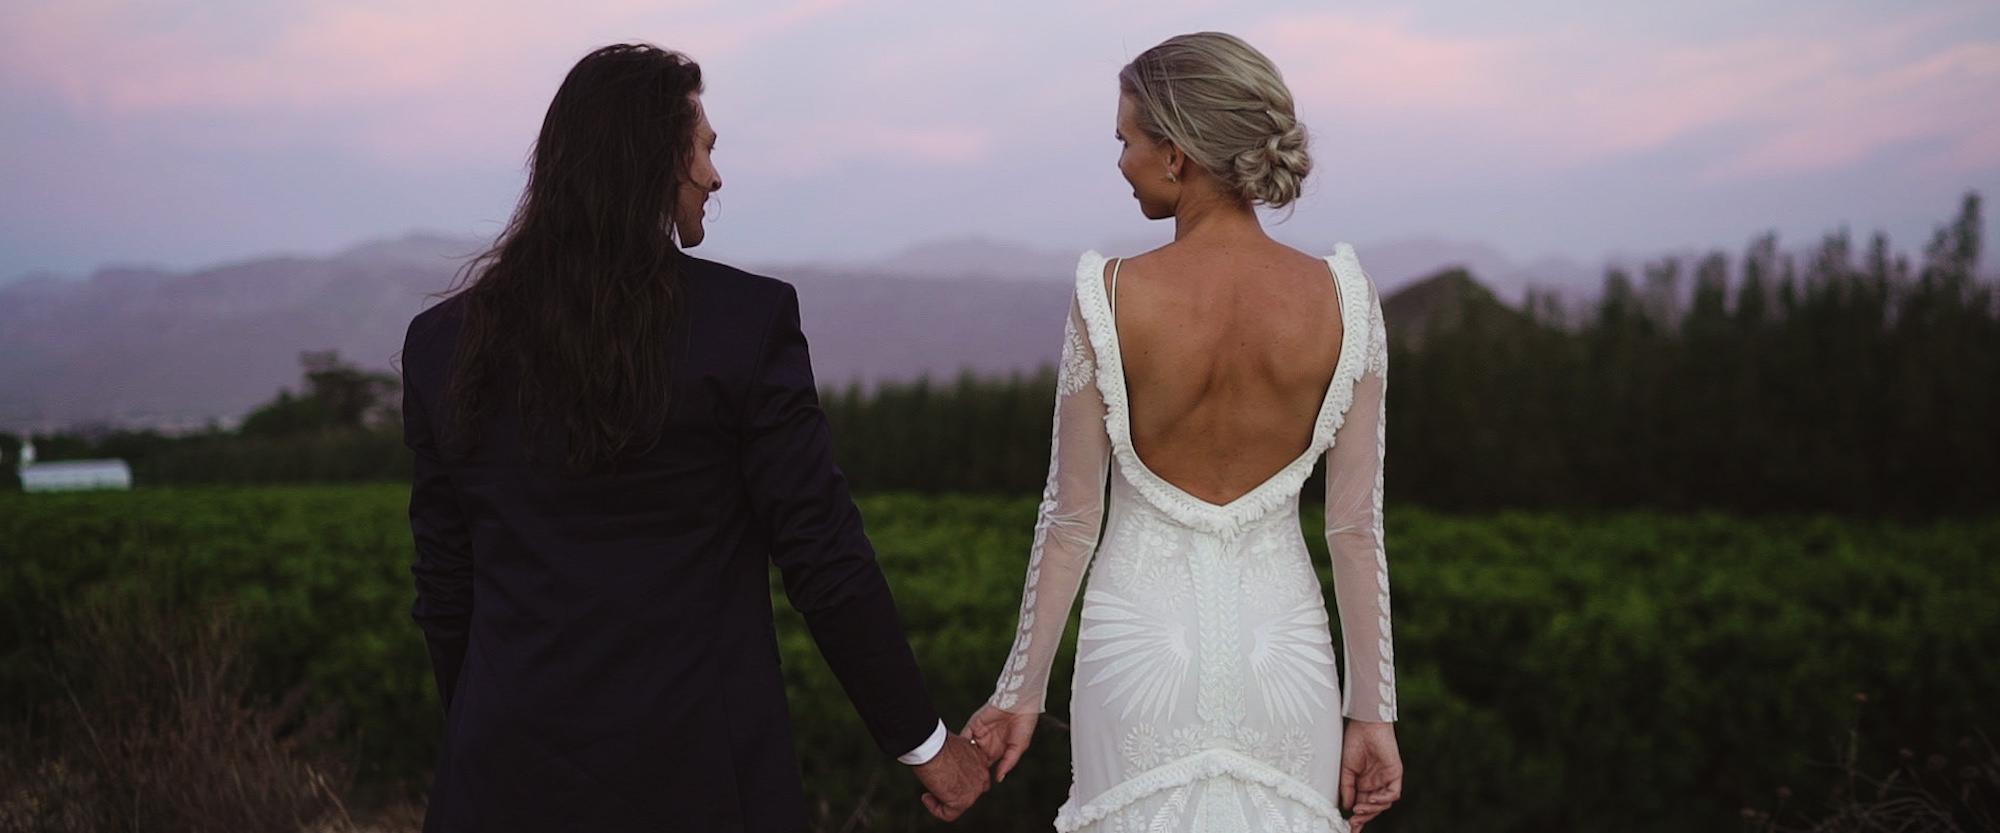 HeathEmelieWeddingFilm_Babylonstoren_Wedding_11.jpg